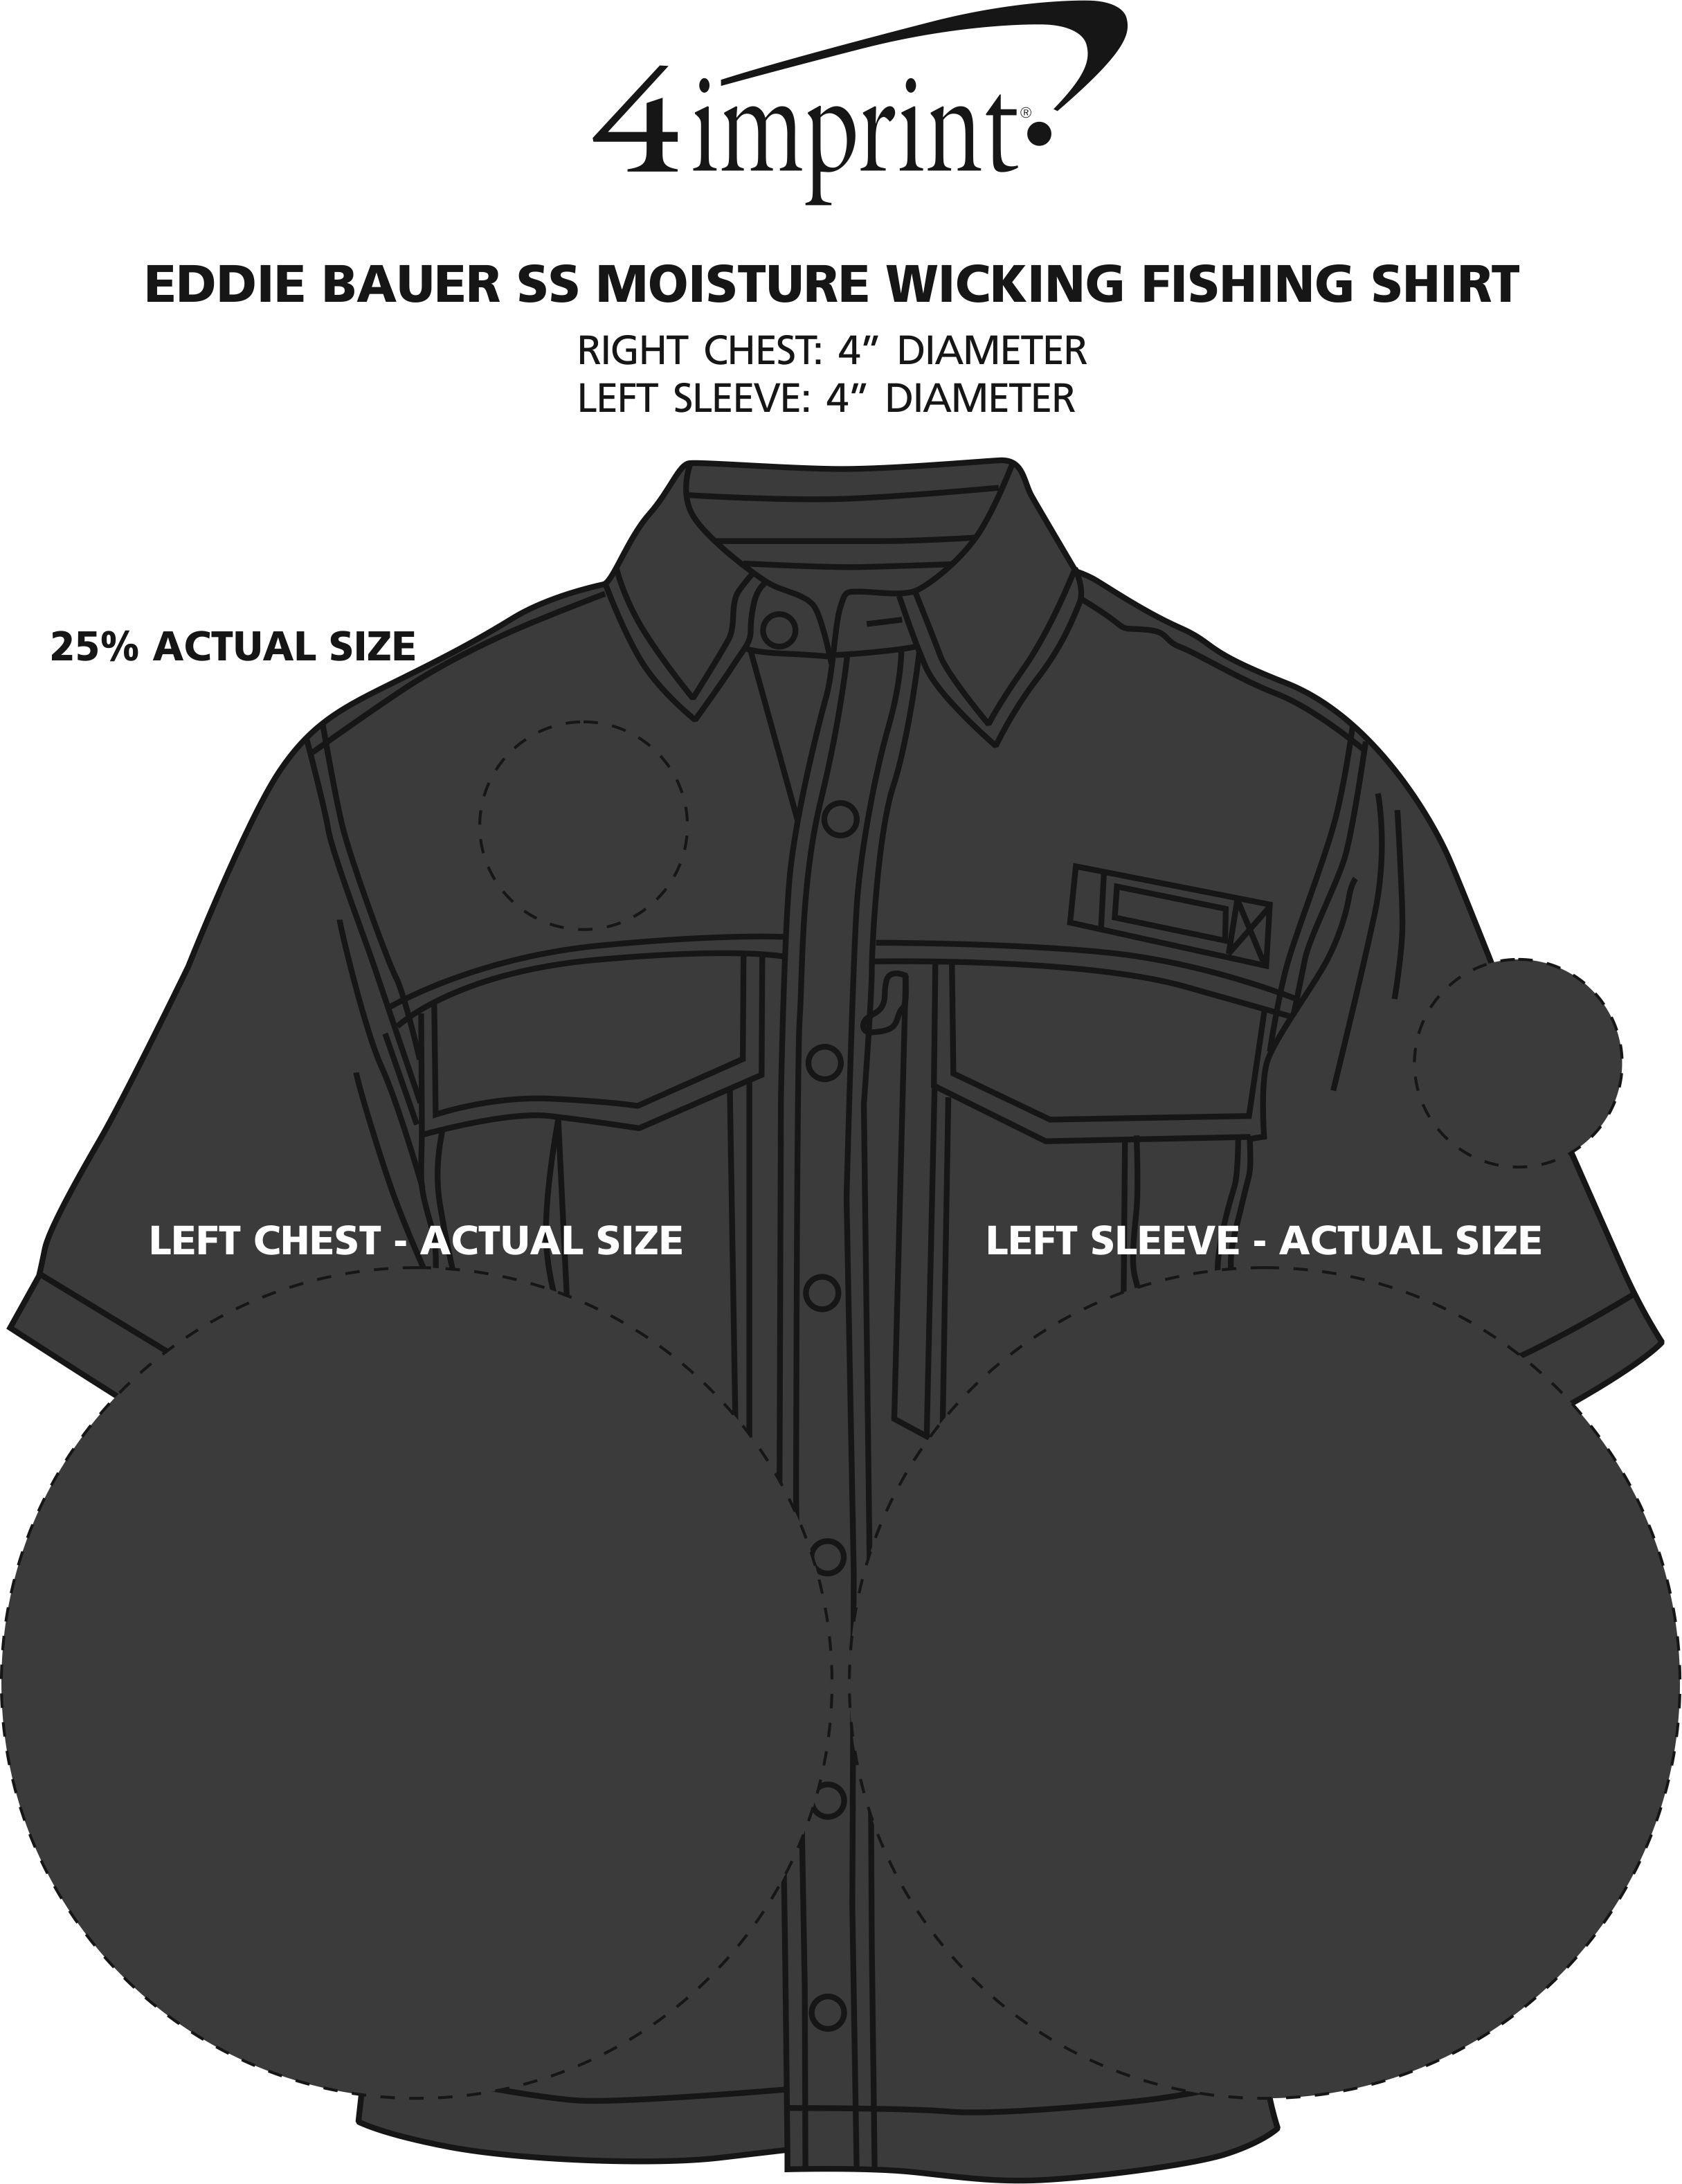 Imprint Area of Eddie Bauer SS Moisture Wicking Fishing Shirt